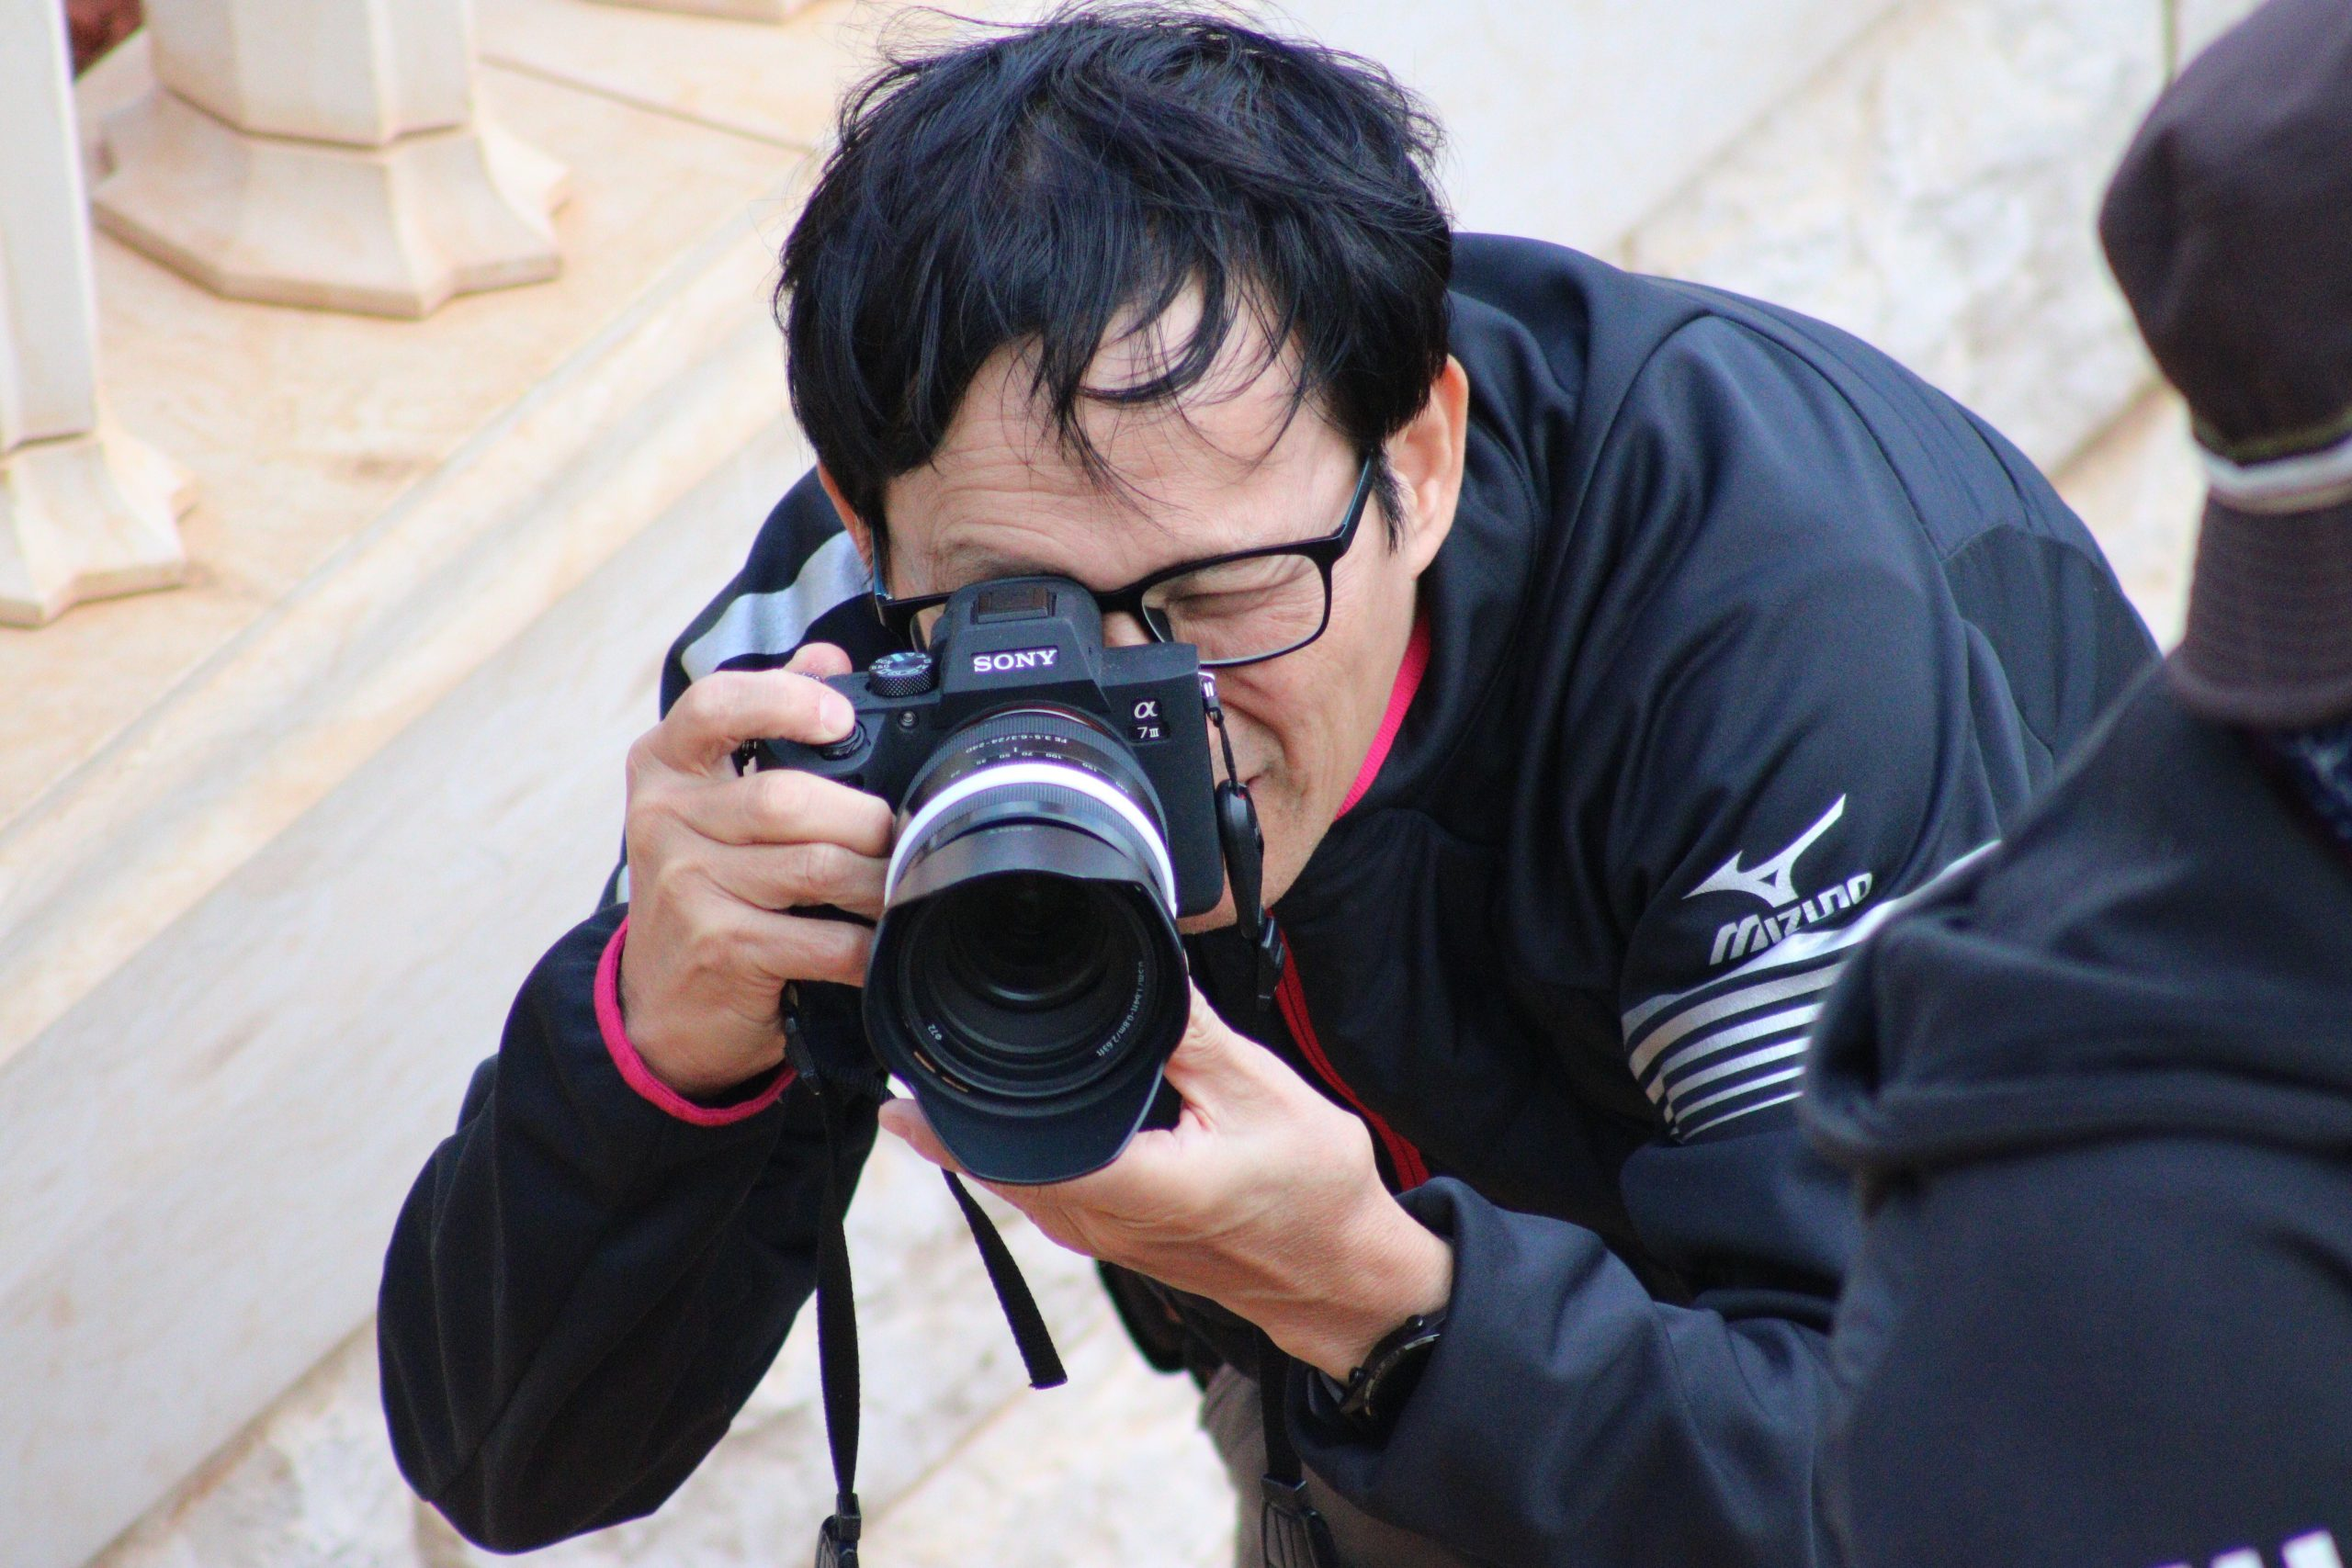 Sony Alpha a7 III Mirrorless Camera